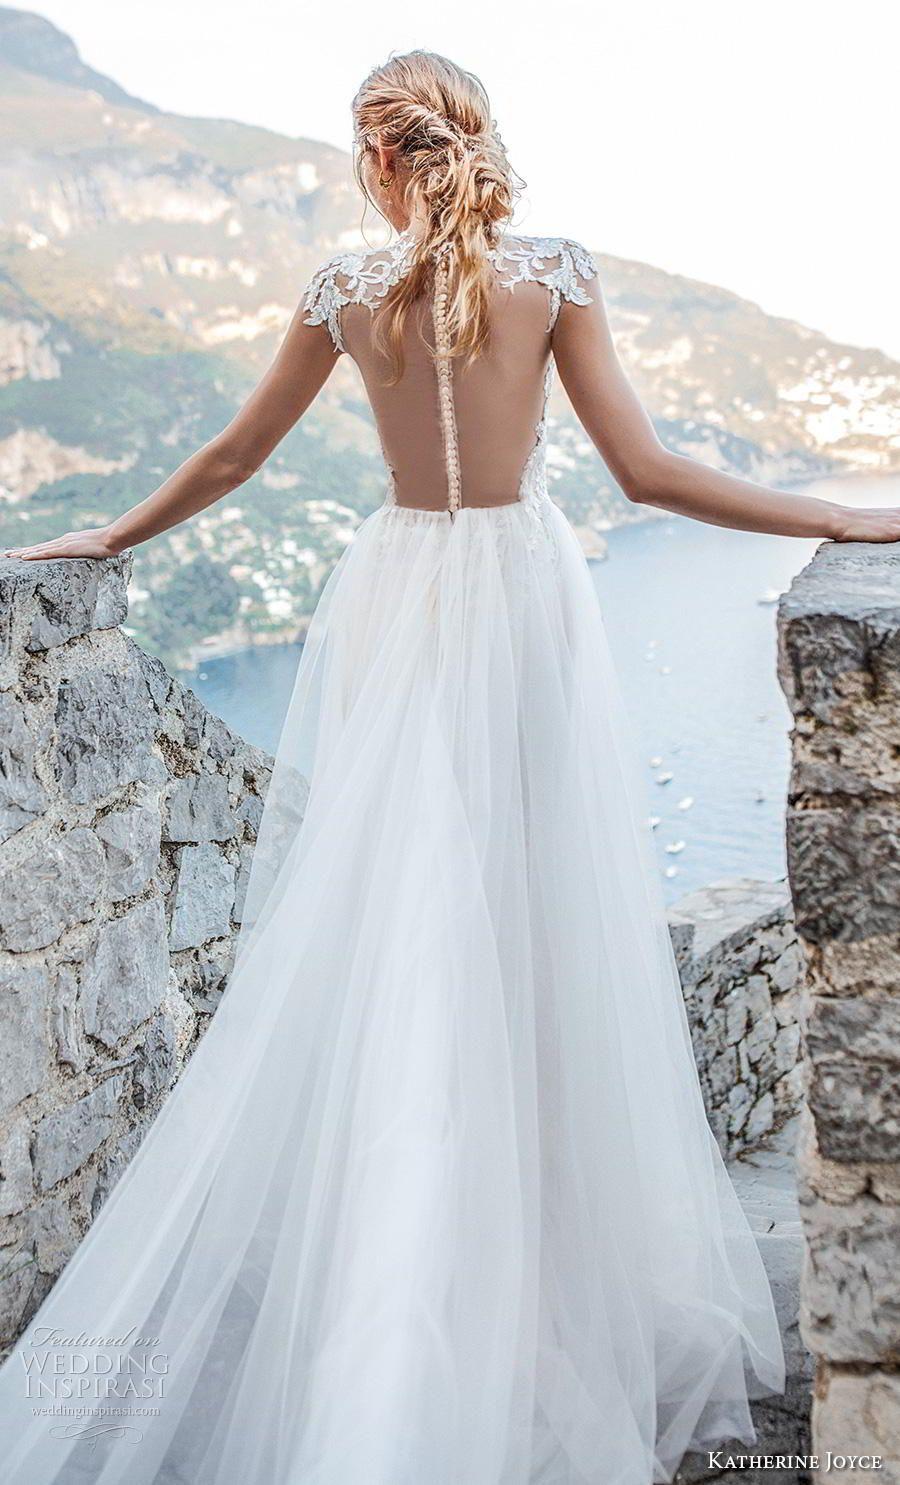 Katherine joyce wedding dresses u ucnapoliud bridal collection în